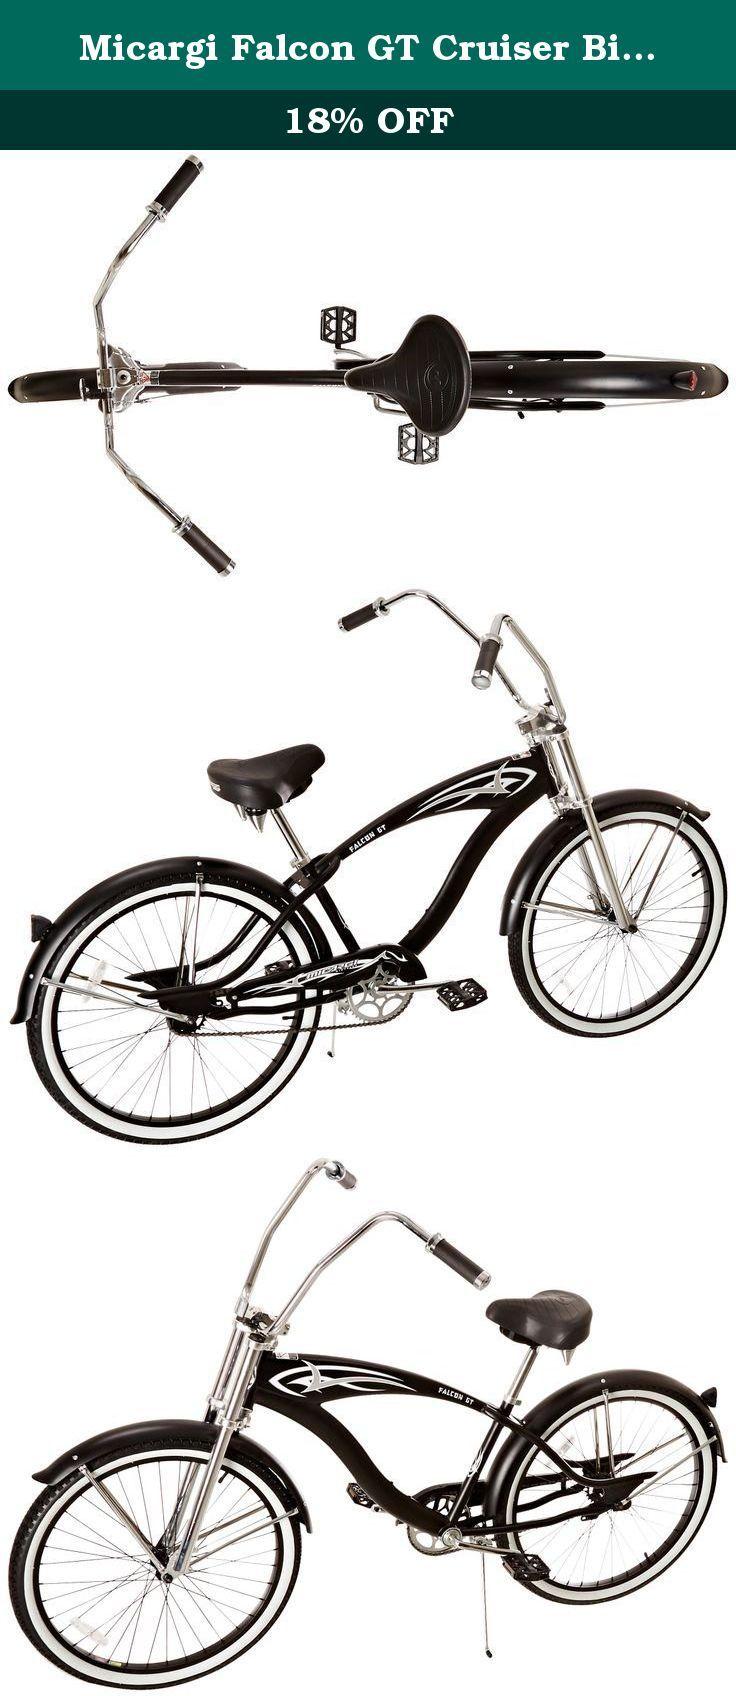 "12/"" Bike ChainGuard w//Line Chrome Lowrider Cruiser Bicycle"